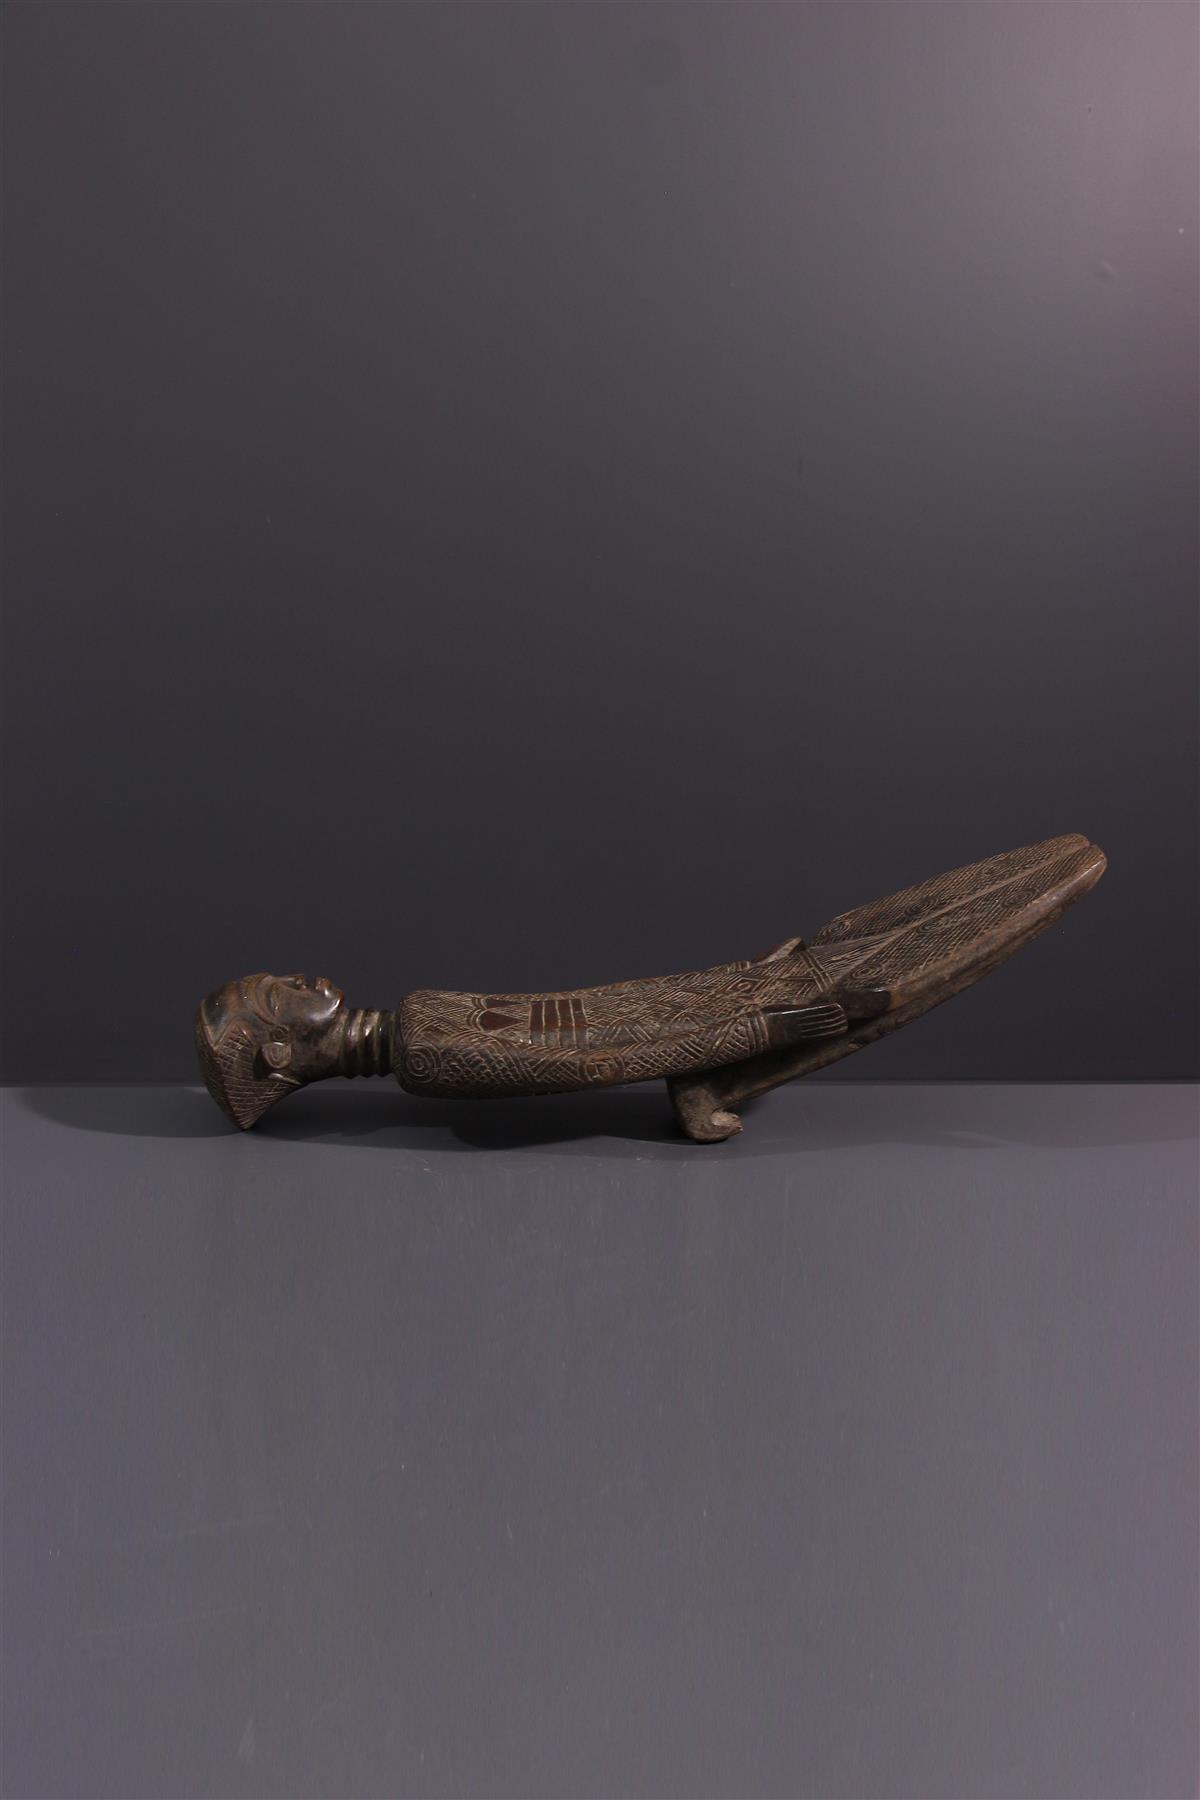 Ndengese rugleuningsteun - Afrikaanse kunst